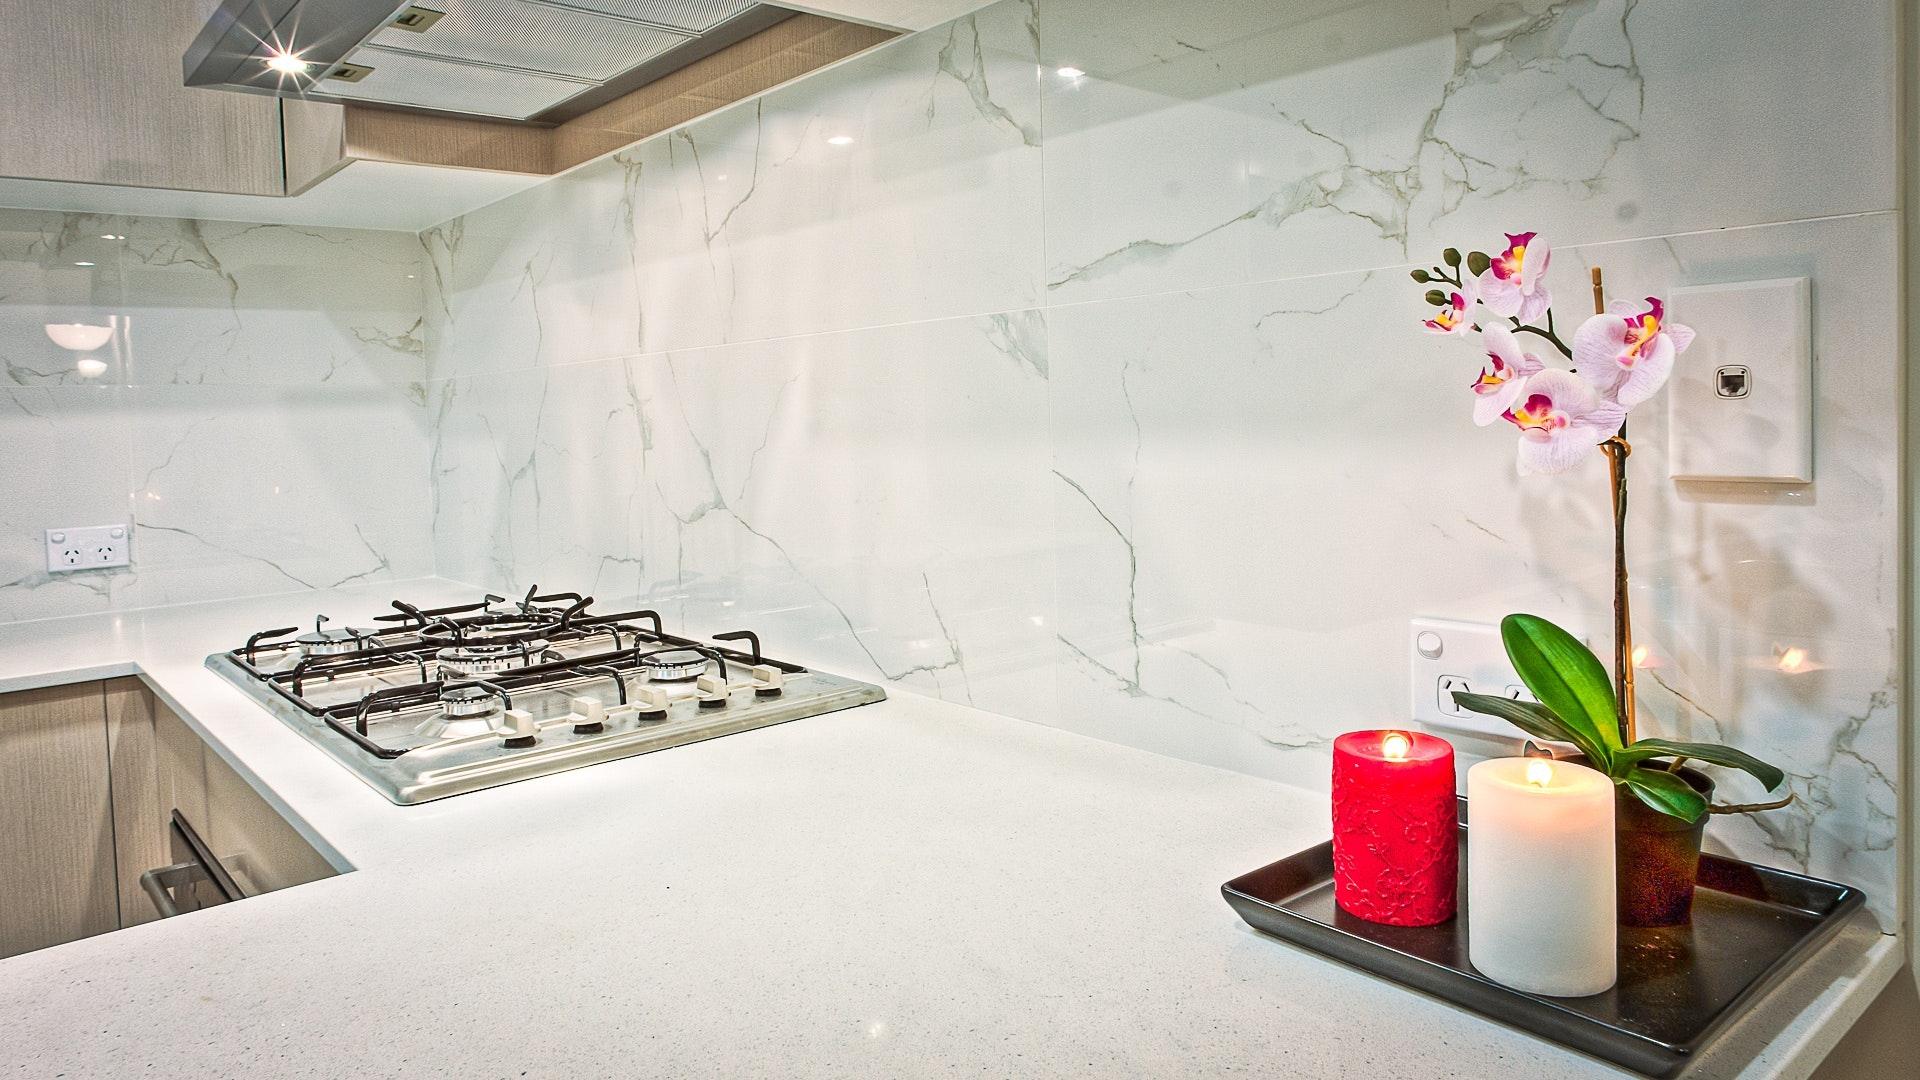 backsplash-candles-contemporary-210687.jpg